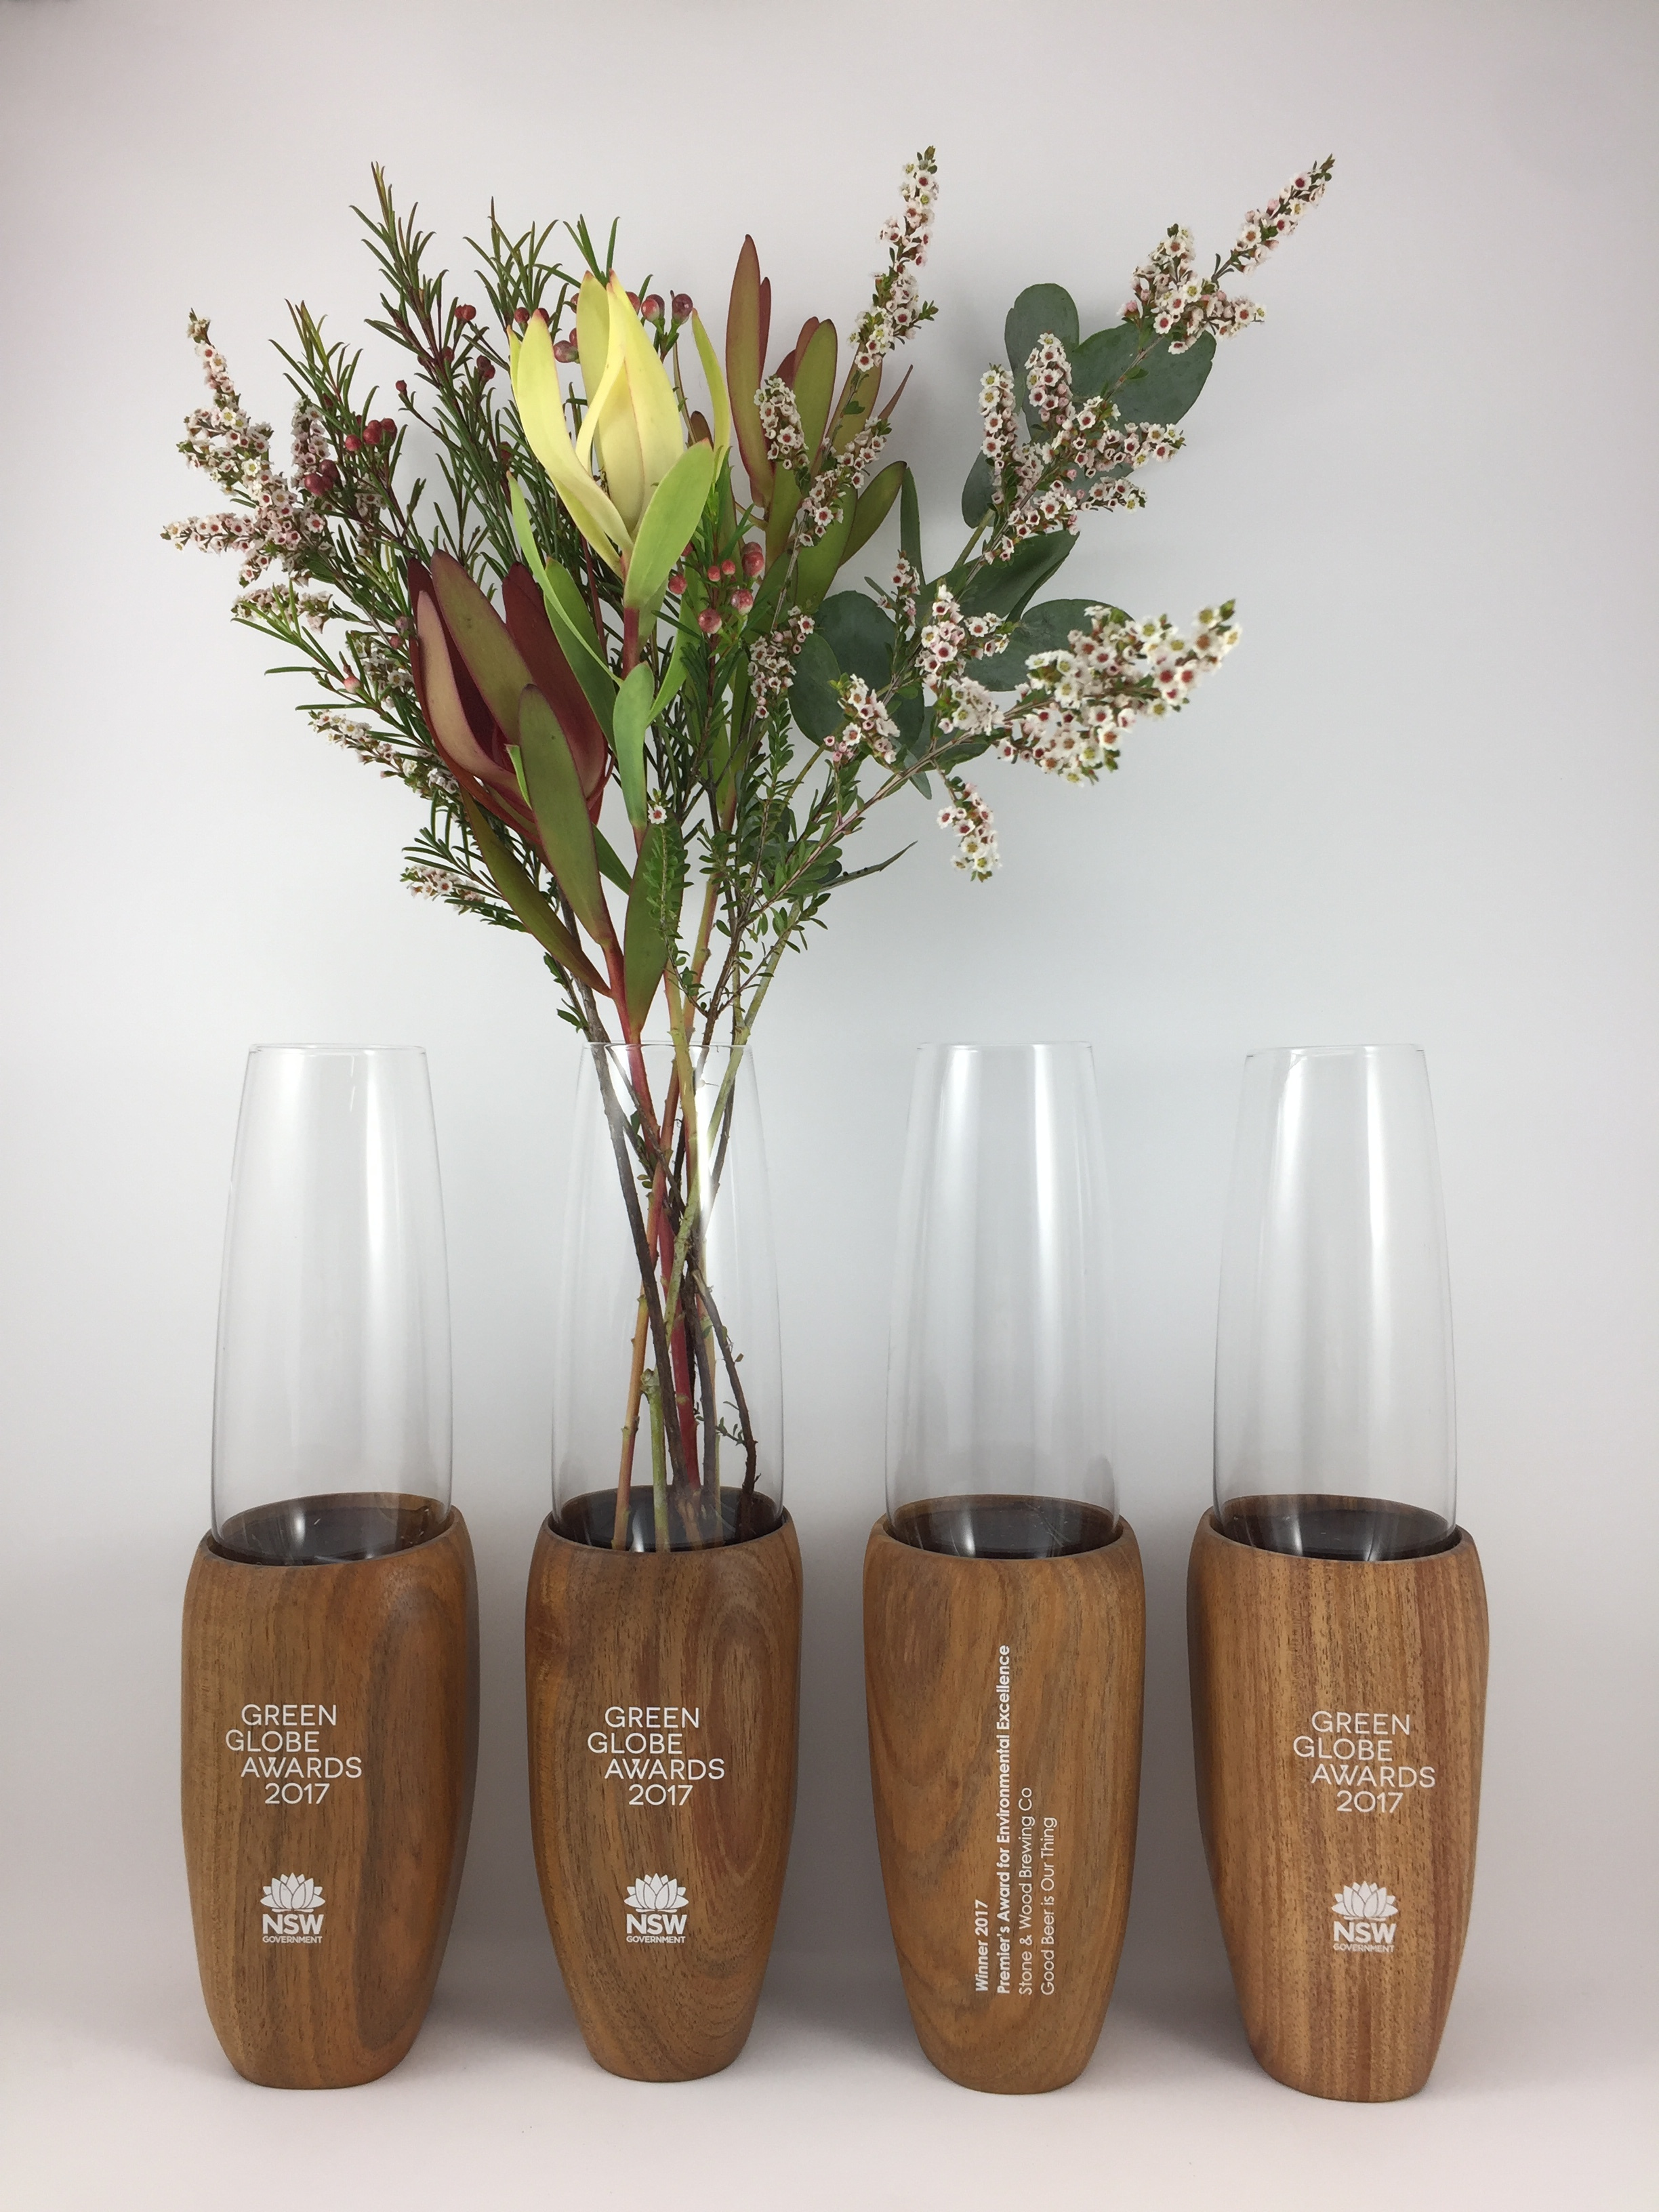 green-globe-awards-timber-eco-glass-trophy-vase-06.jpg